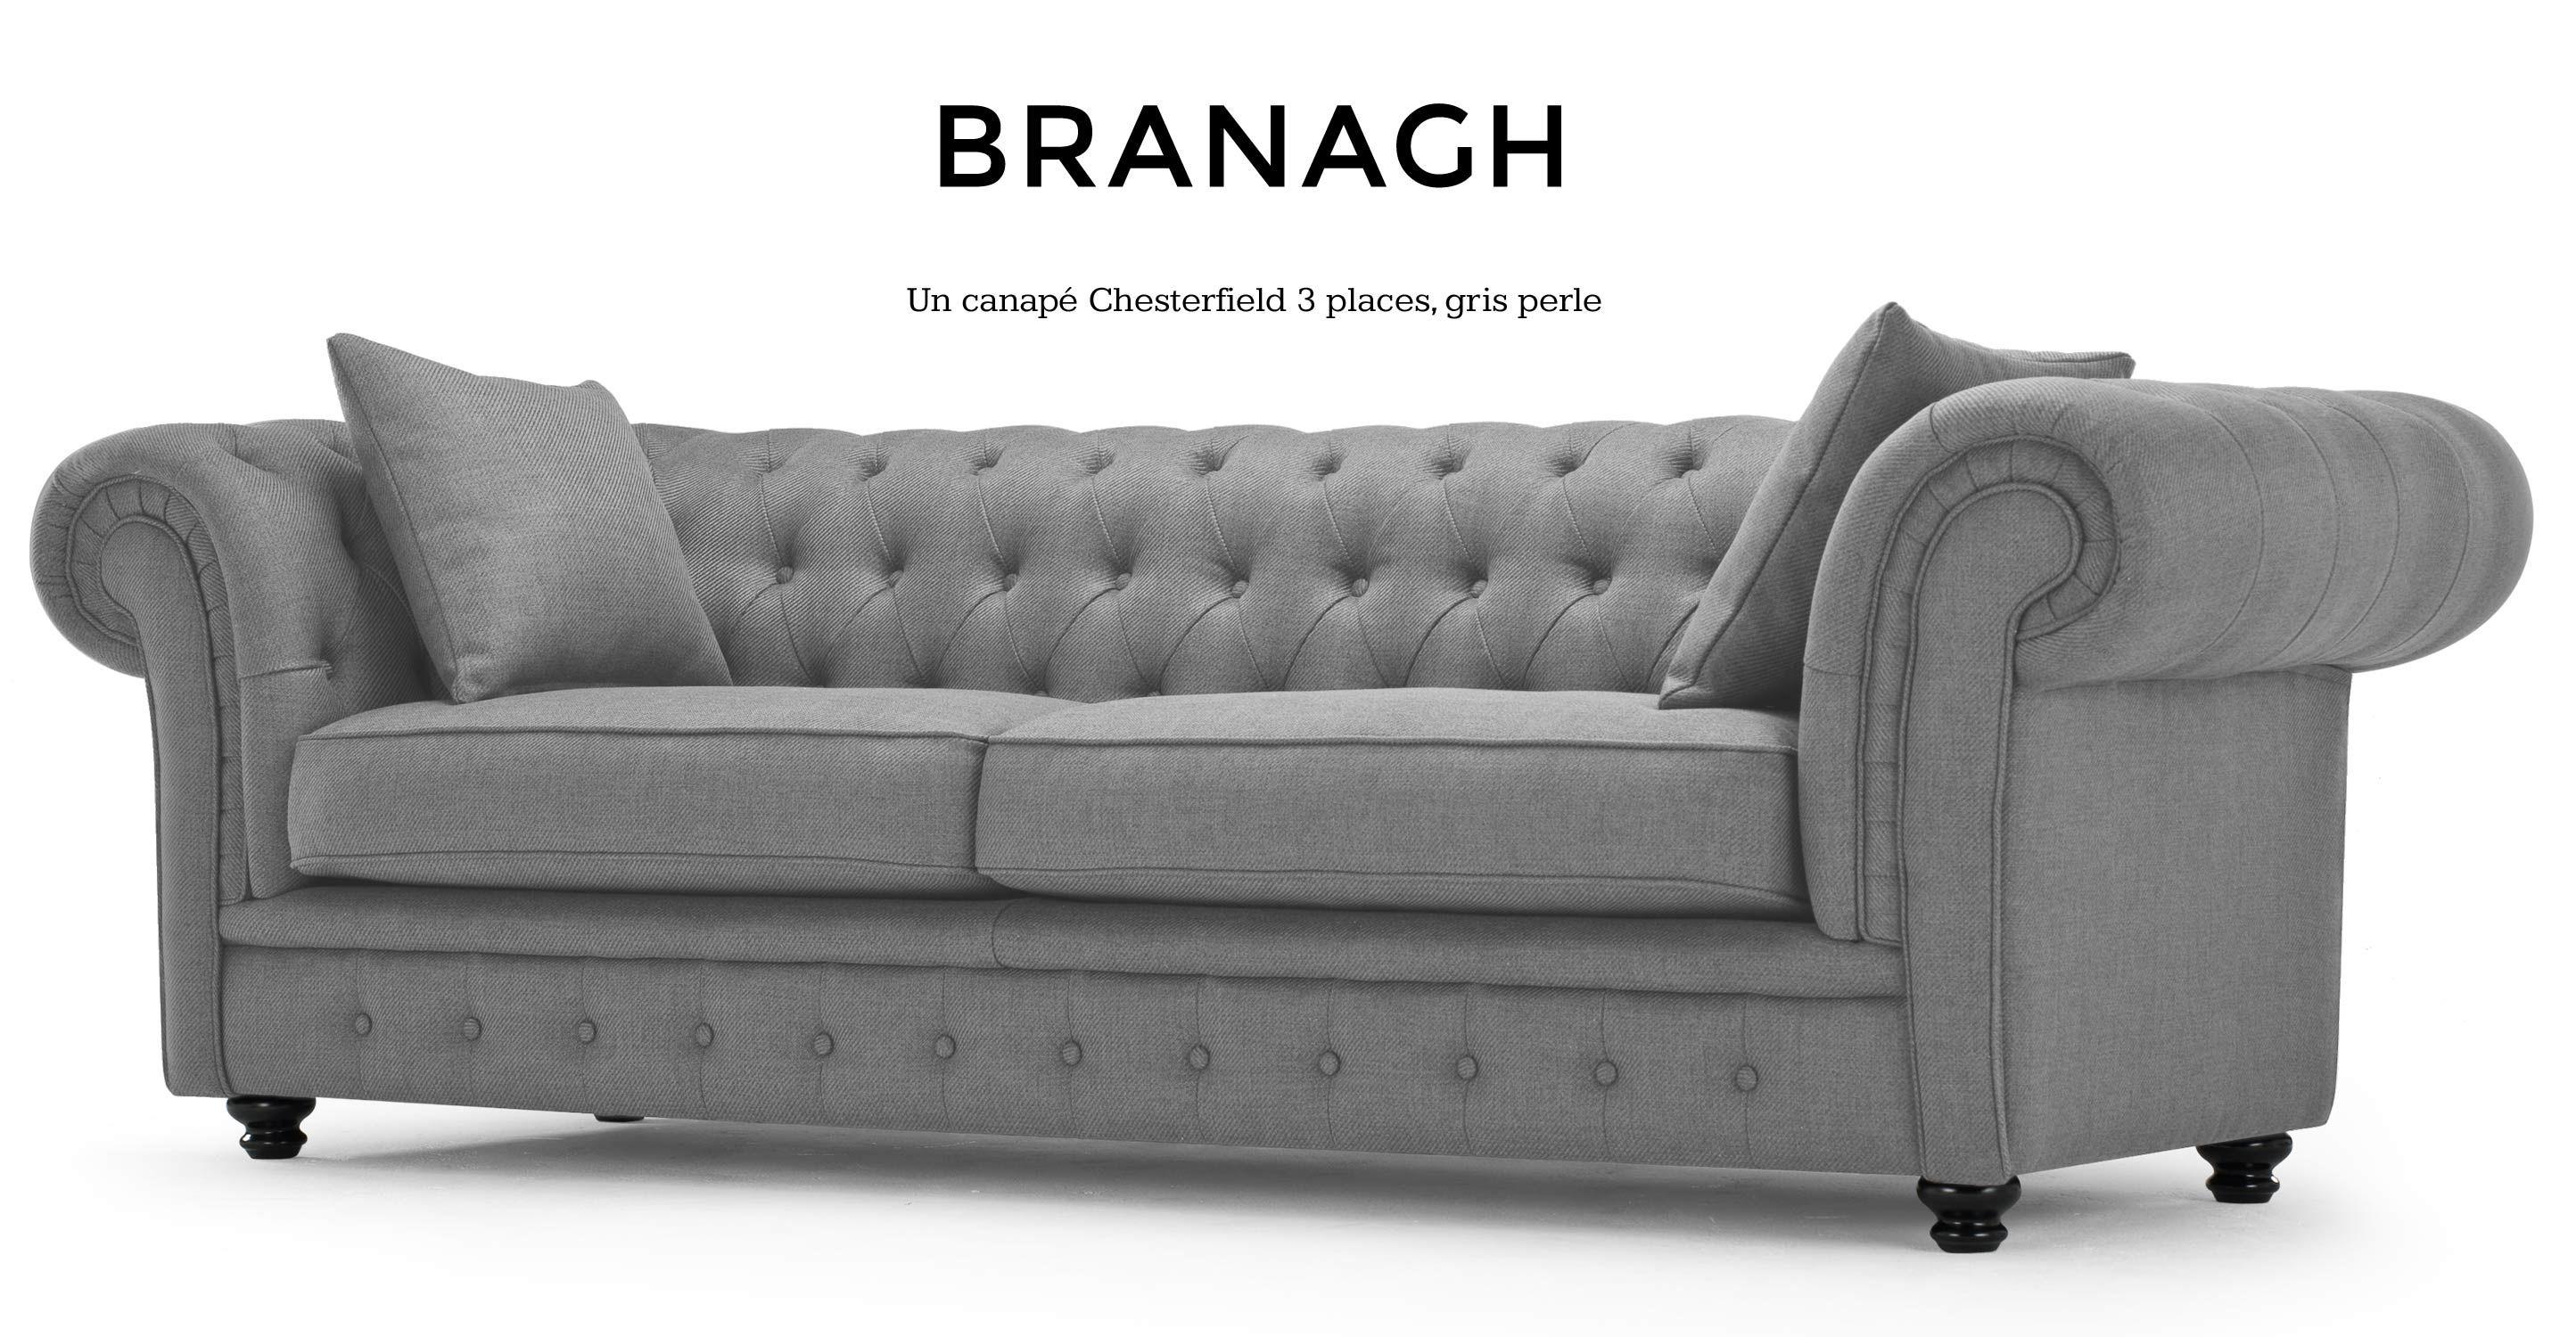 Branagh 3 Seater Chesterfield Sofa Pearl Grey Fabric Chesterfield Sofa Grey Chesterfield Sofa Brown Chesterfield Sofa